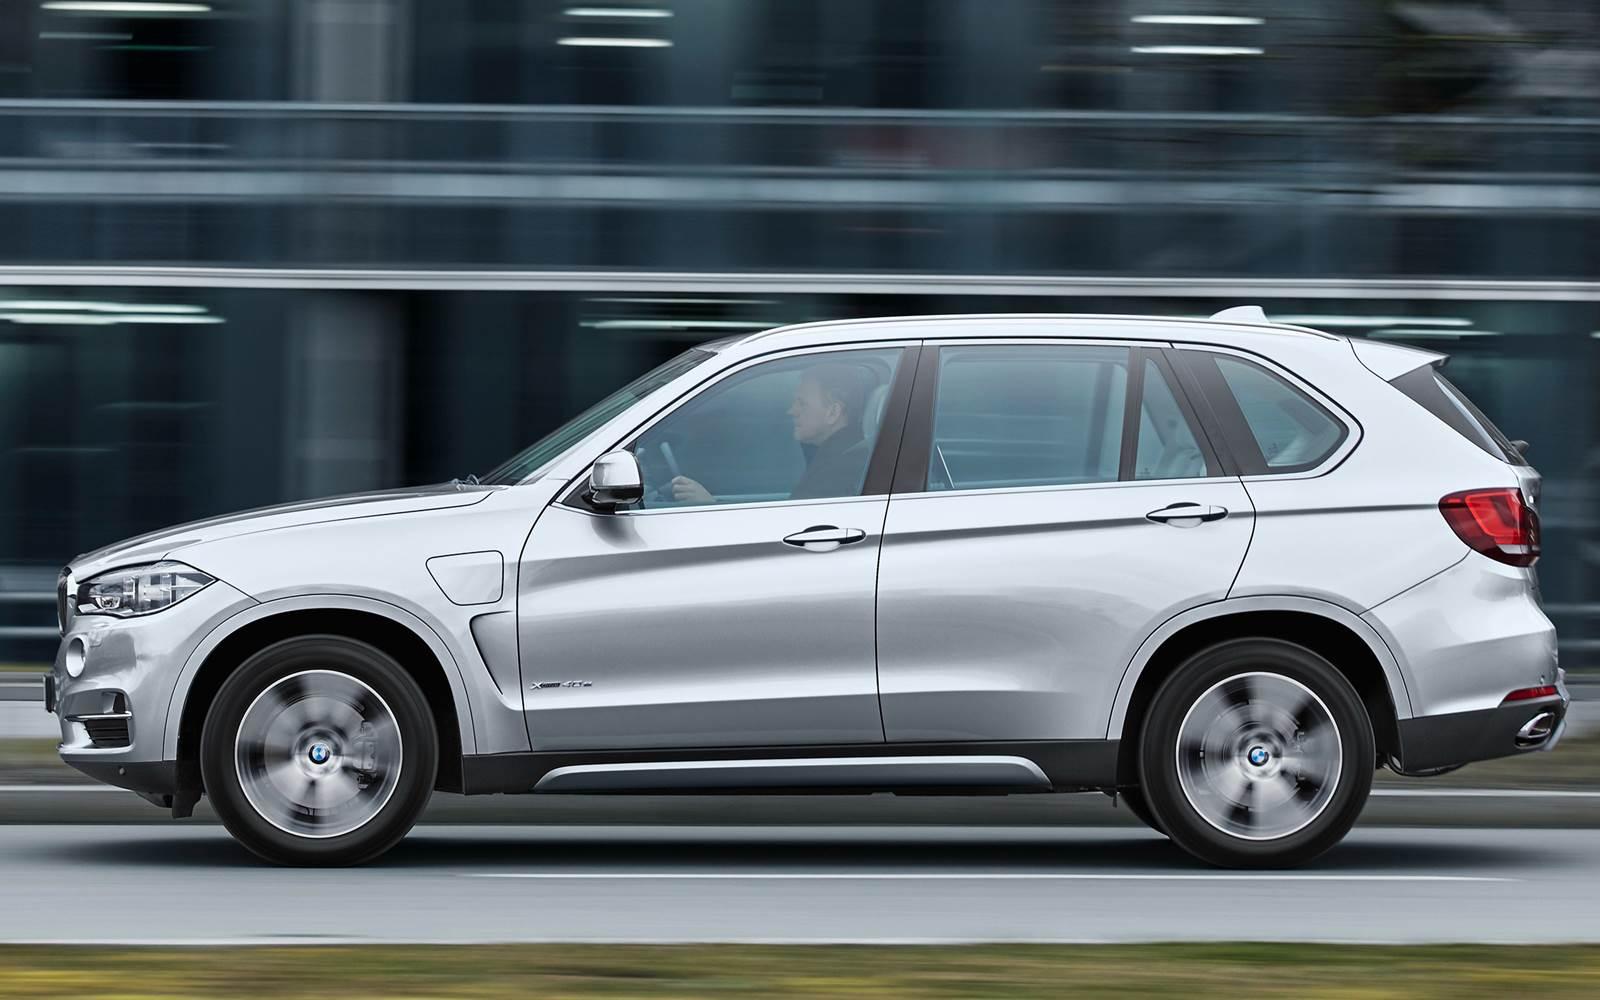 Novo BMW X5 2015 xDrive40e híbrido plug-in